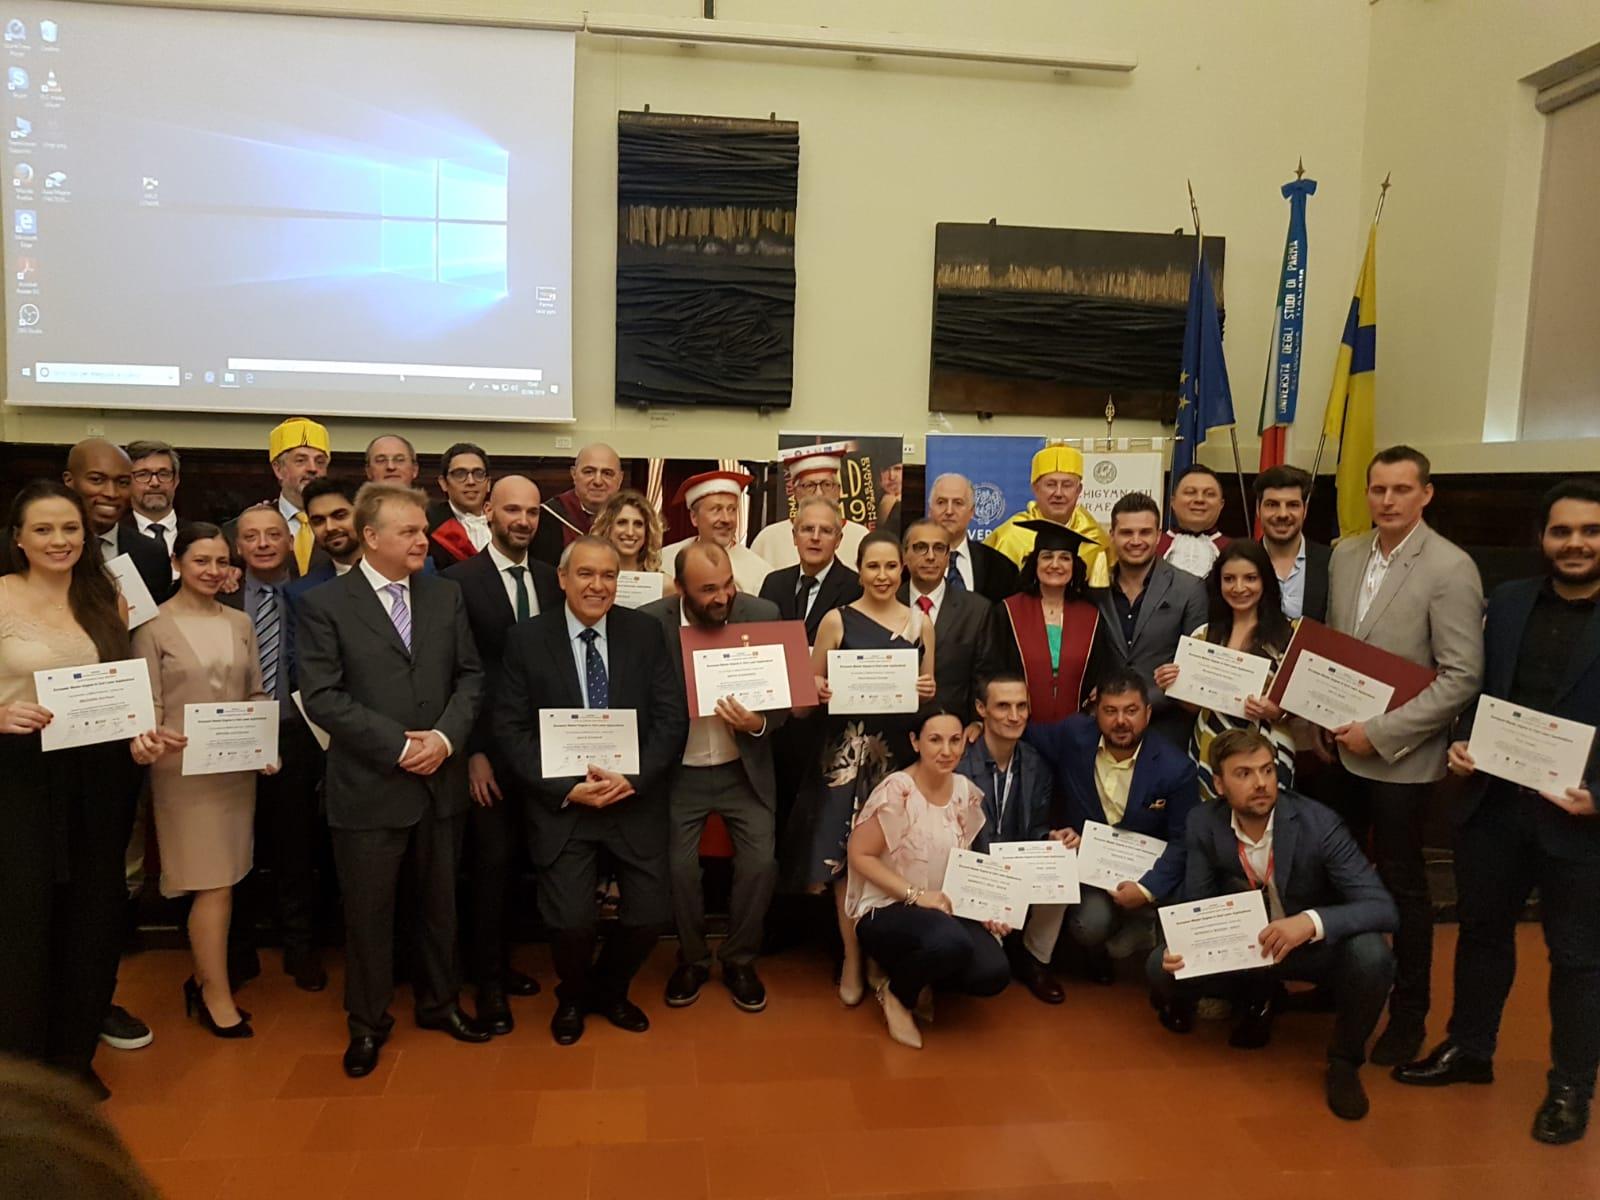 Kongresy WFLD i EMDOLA z polskimi sukcesami